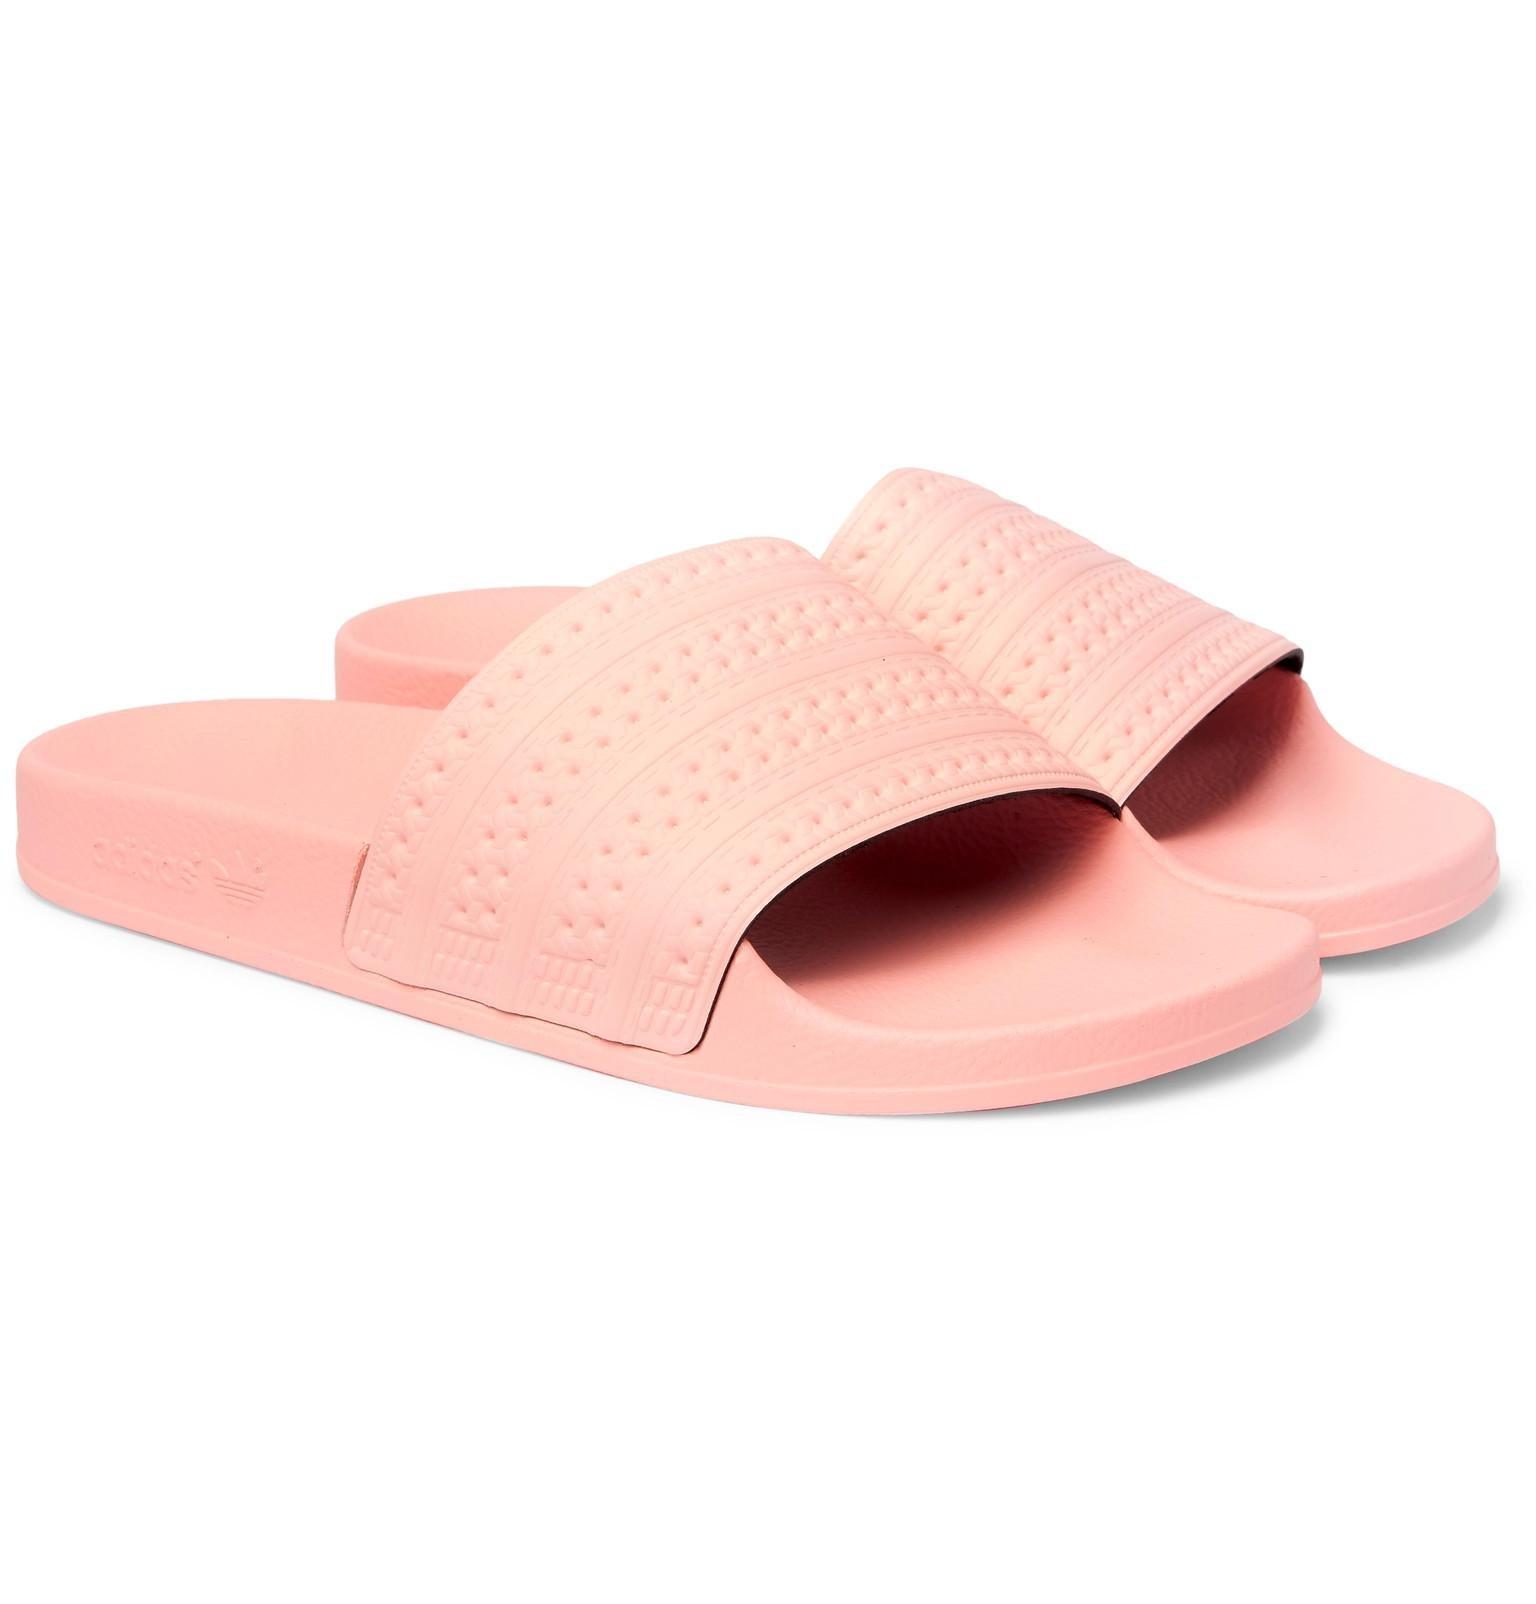 da4446346d85 adidas Originals Adilette Textured-rubber Slides in Pink for Men - Lyst